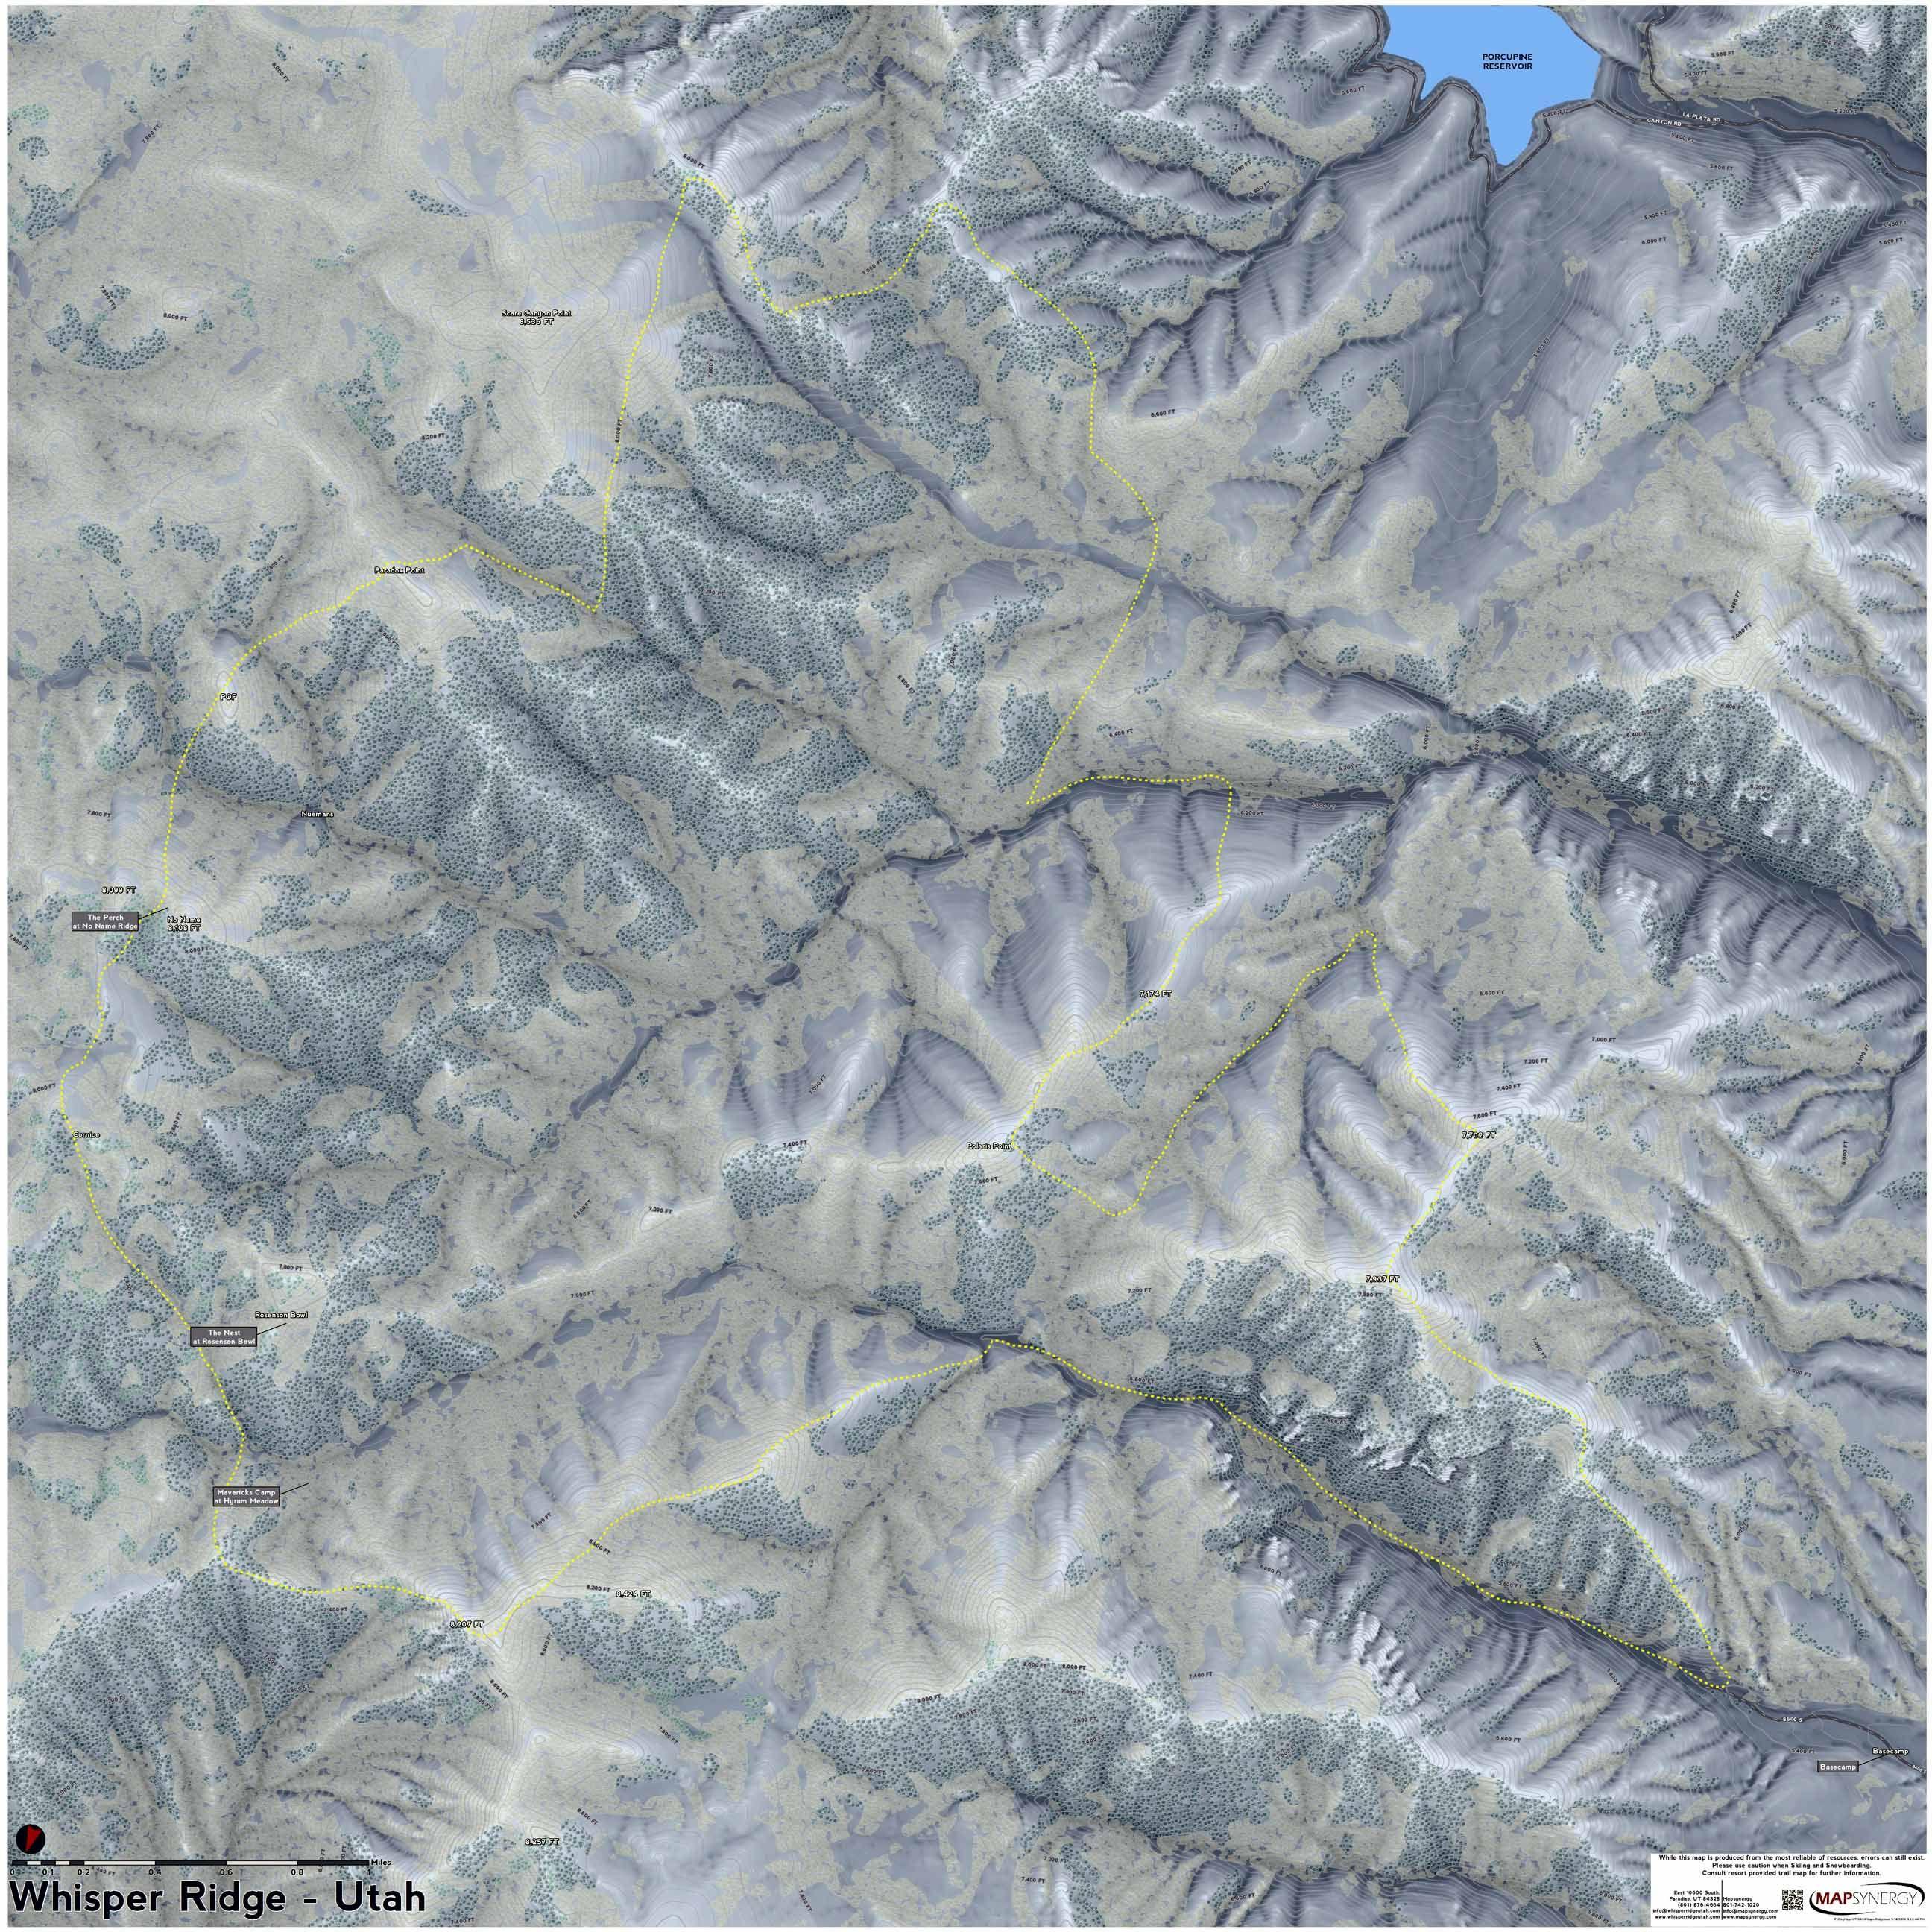 Worksheet. Whisper Ridge Cat Skiing ski map  Utah Ski Resort Maps